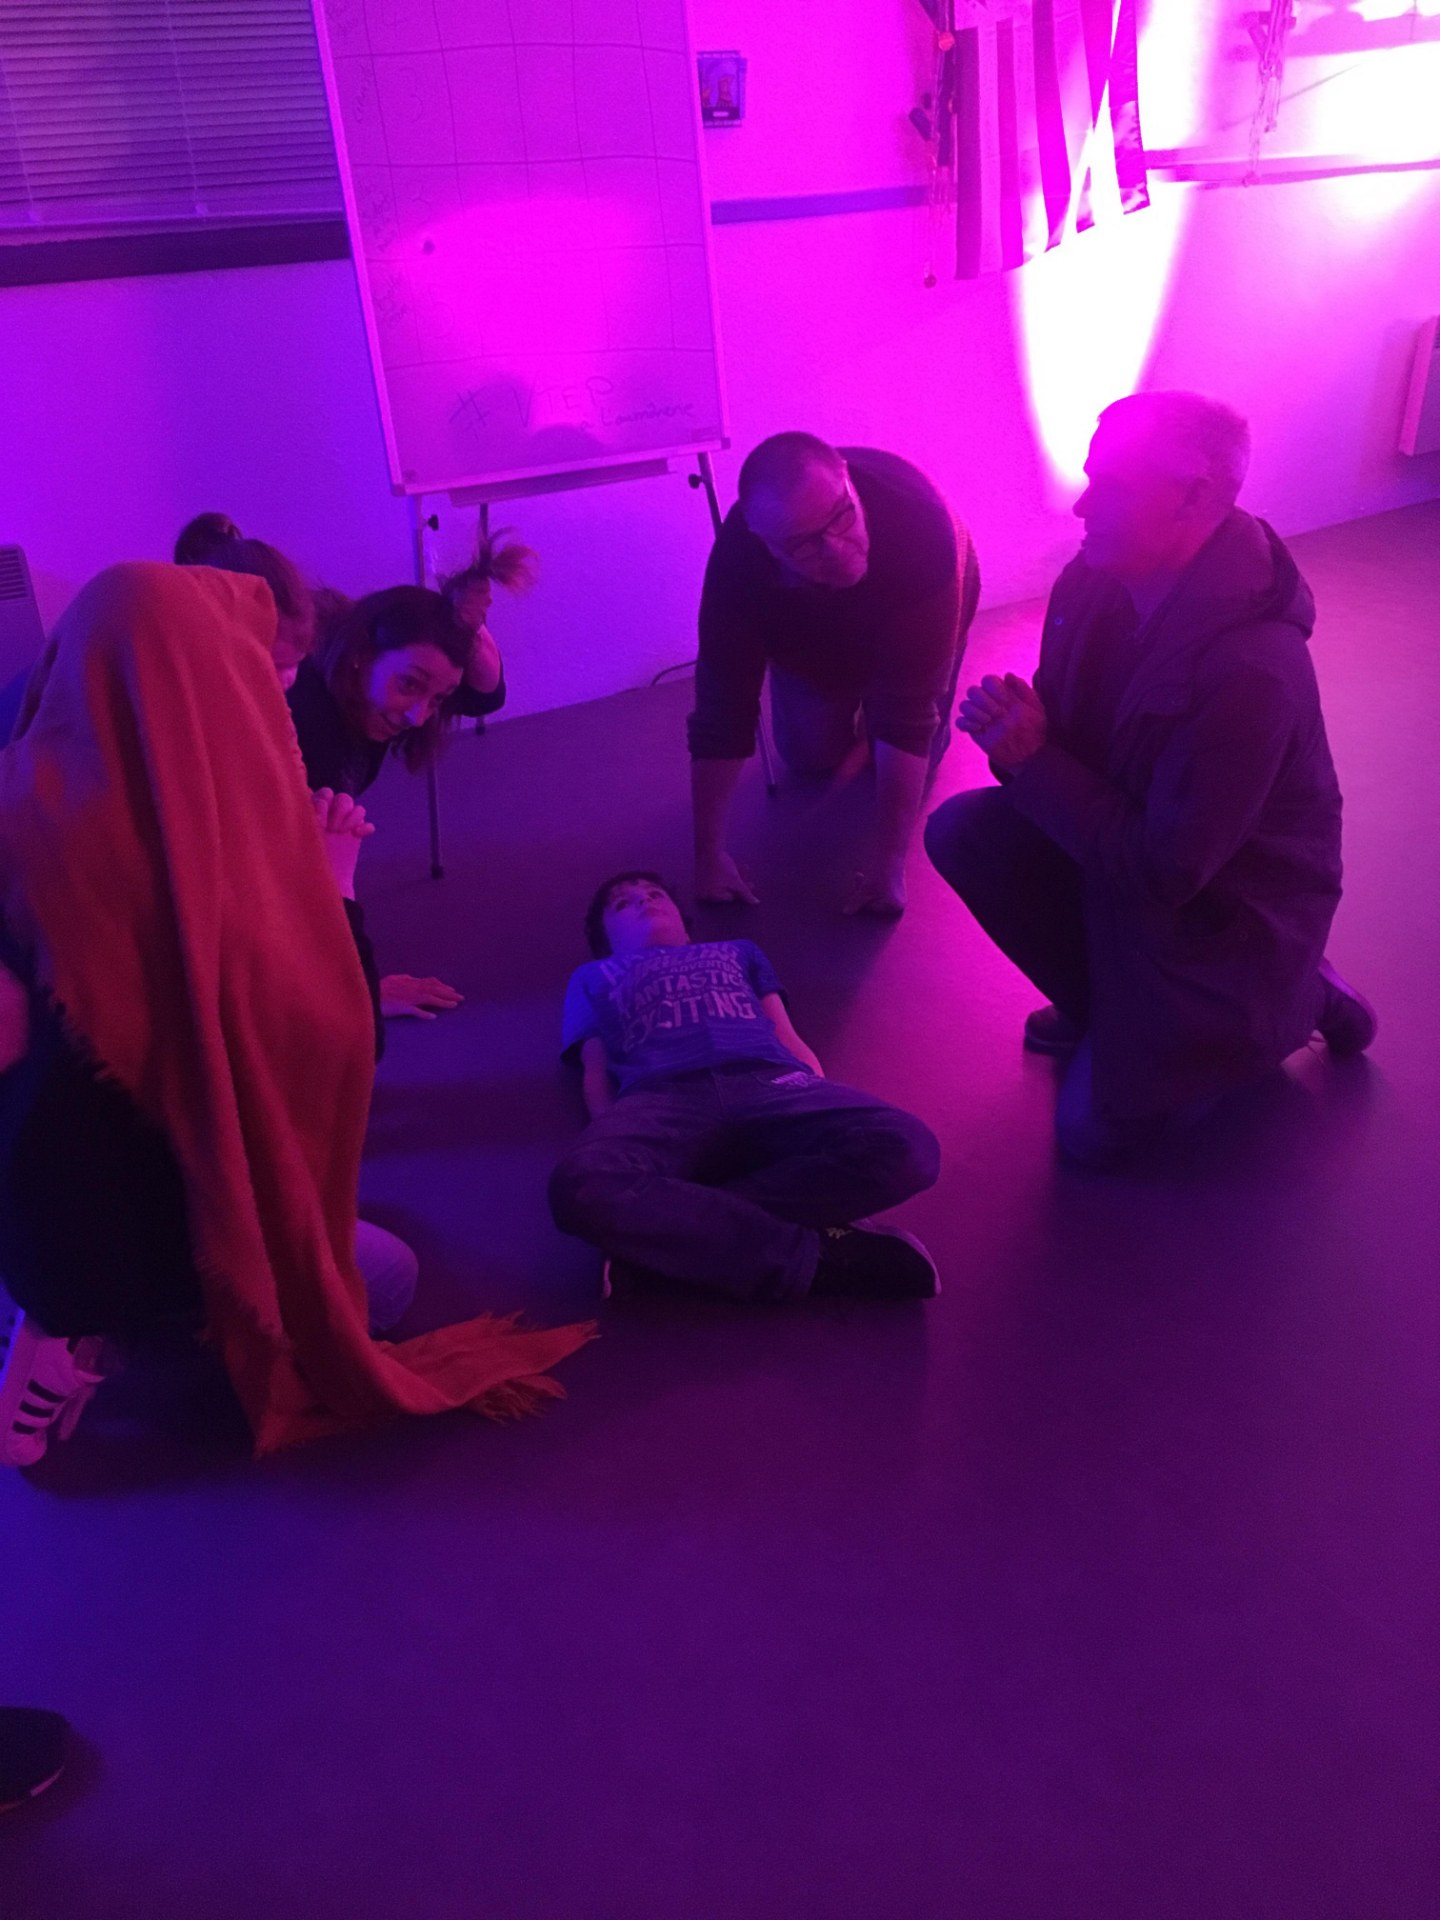 Scene biblique mimee - La naissance de Jesus